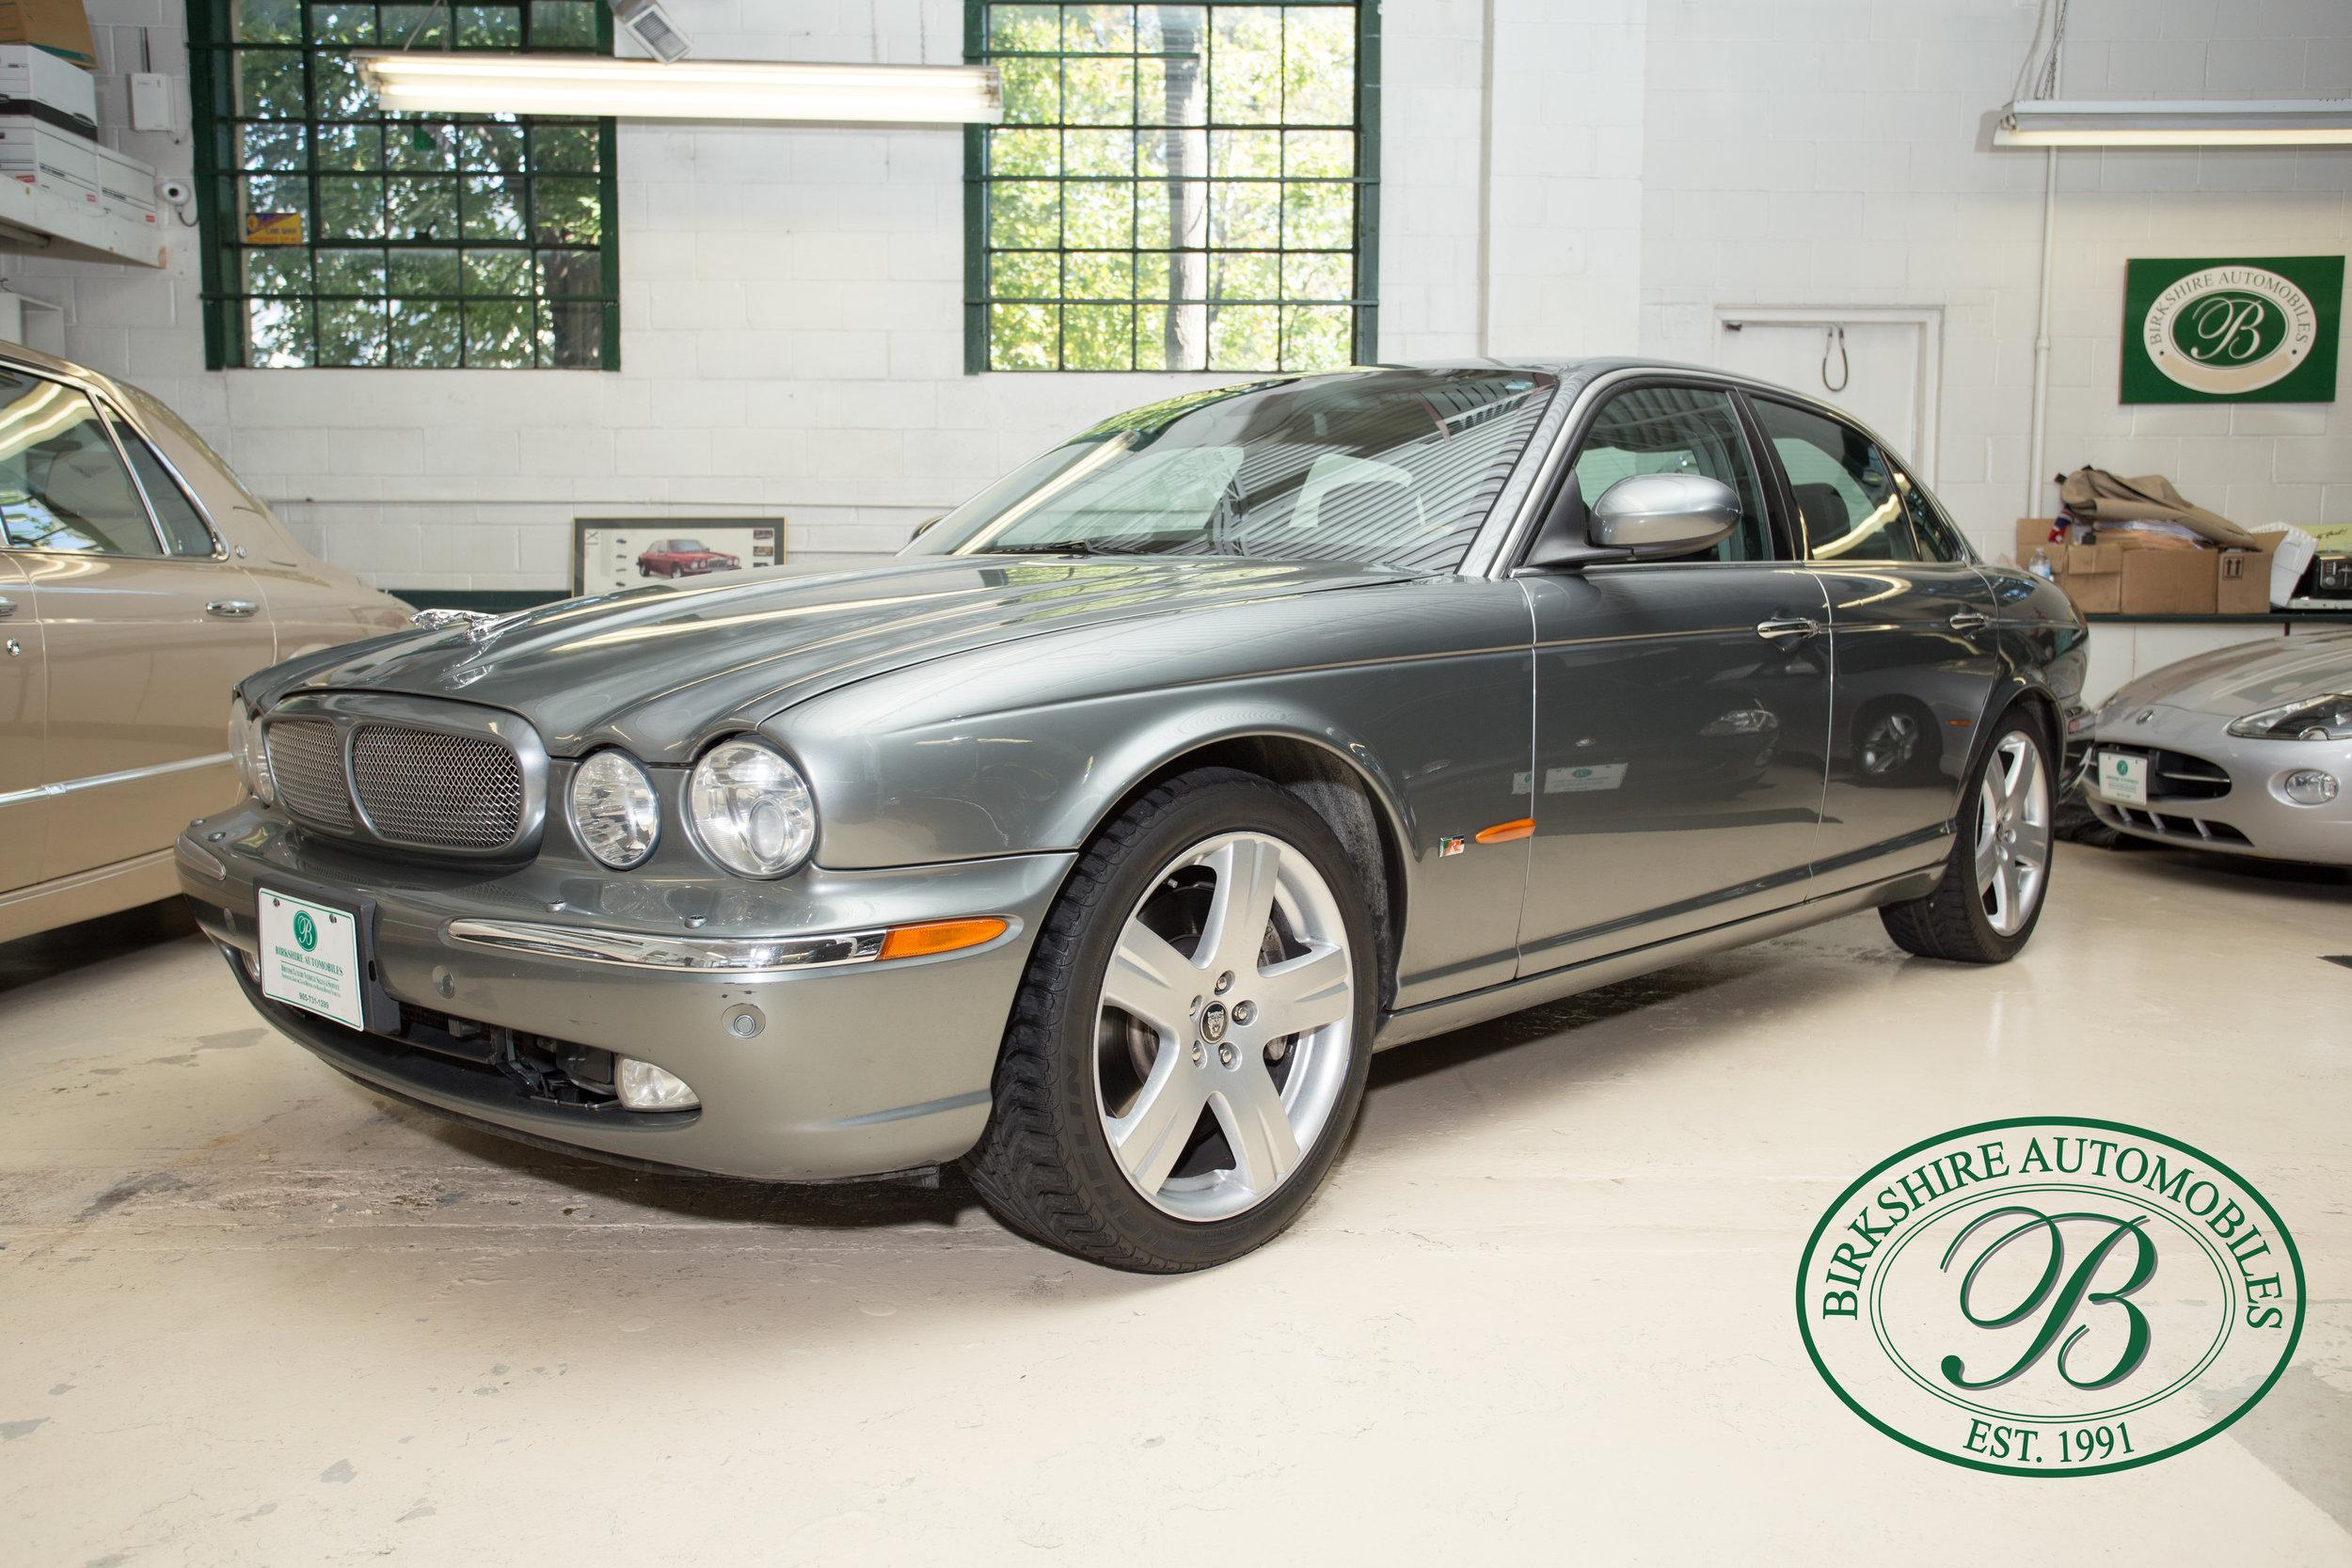 Birkshire Automobiles 2006 Jaguar XJ^-15.jpg